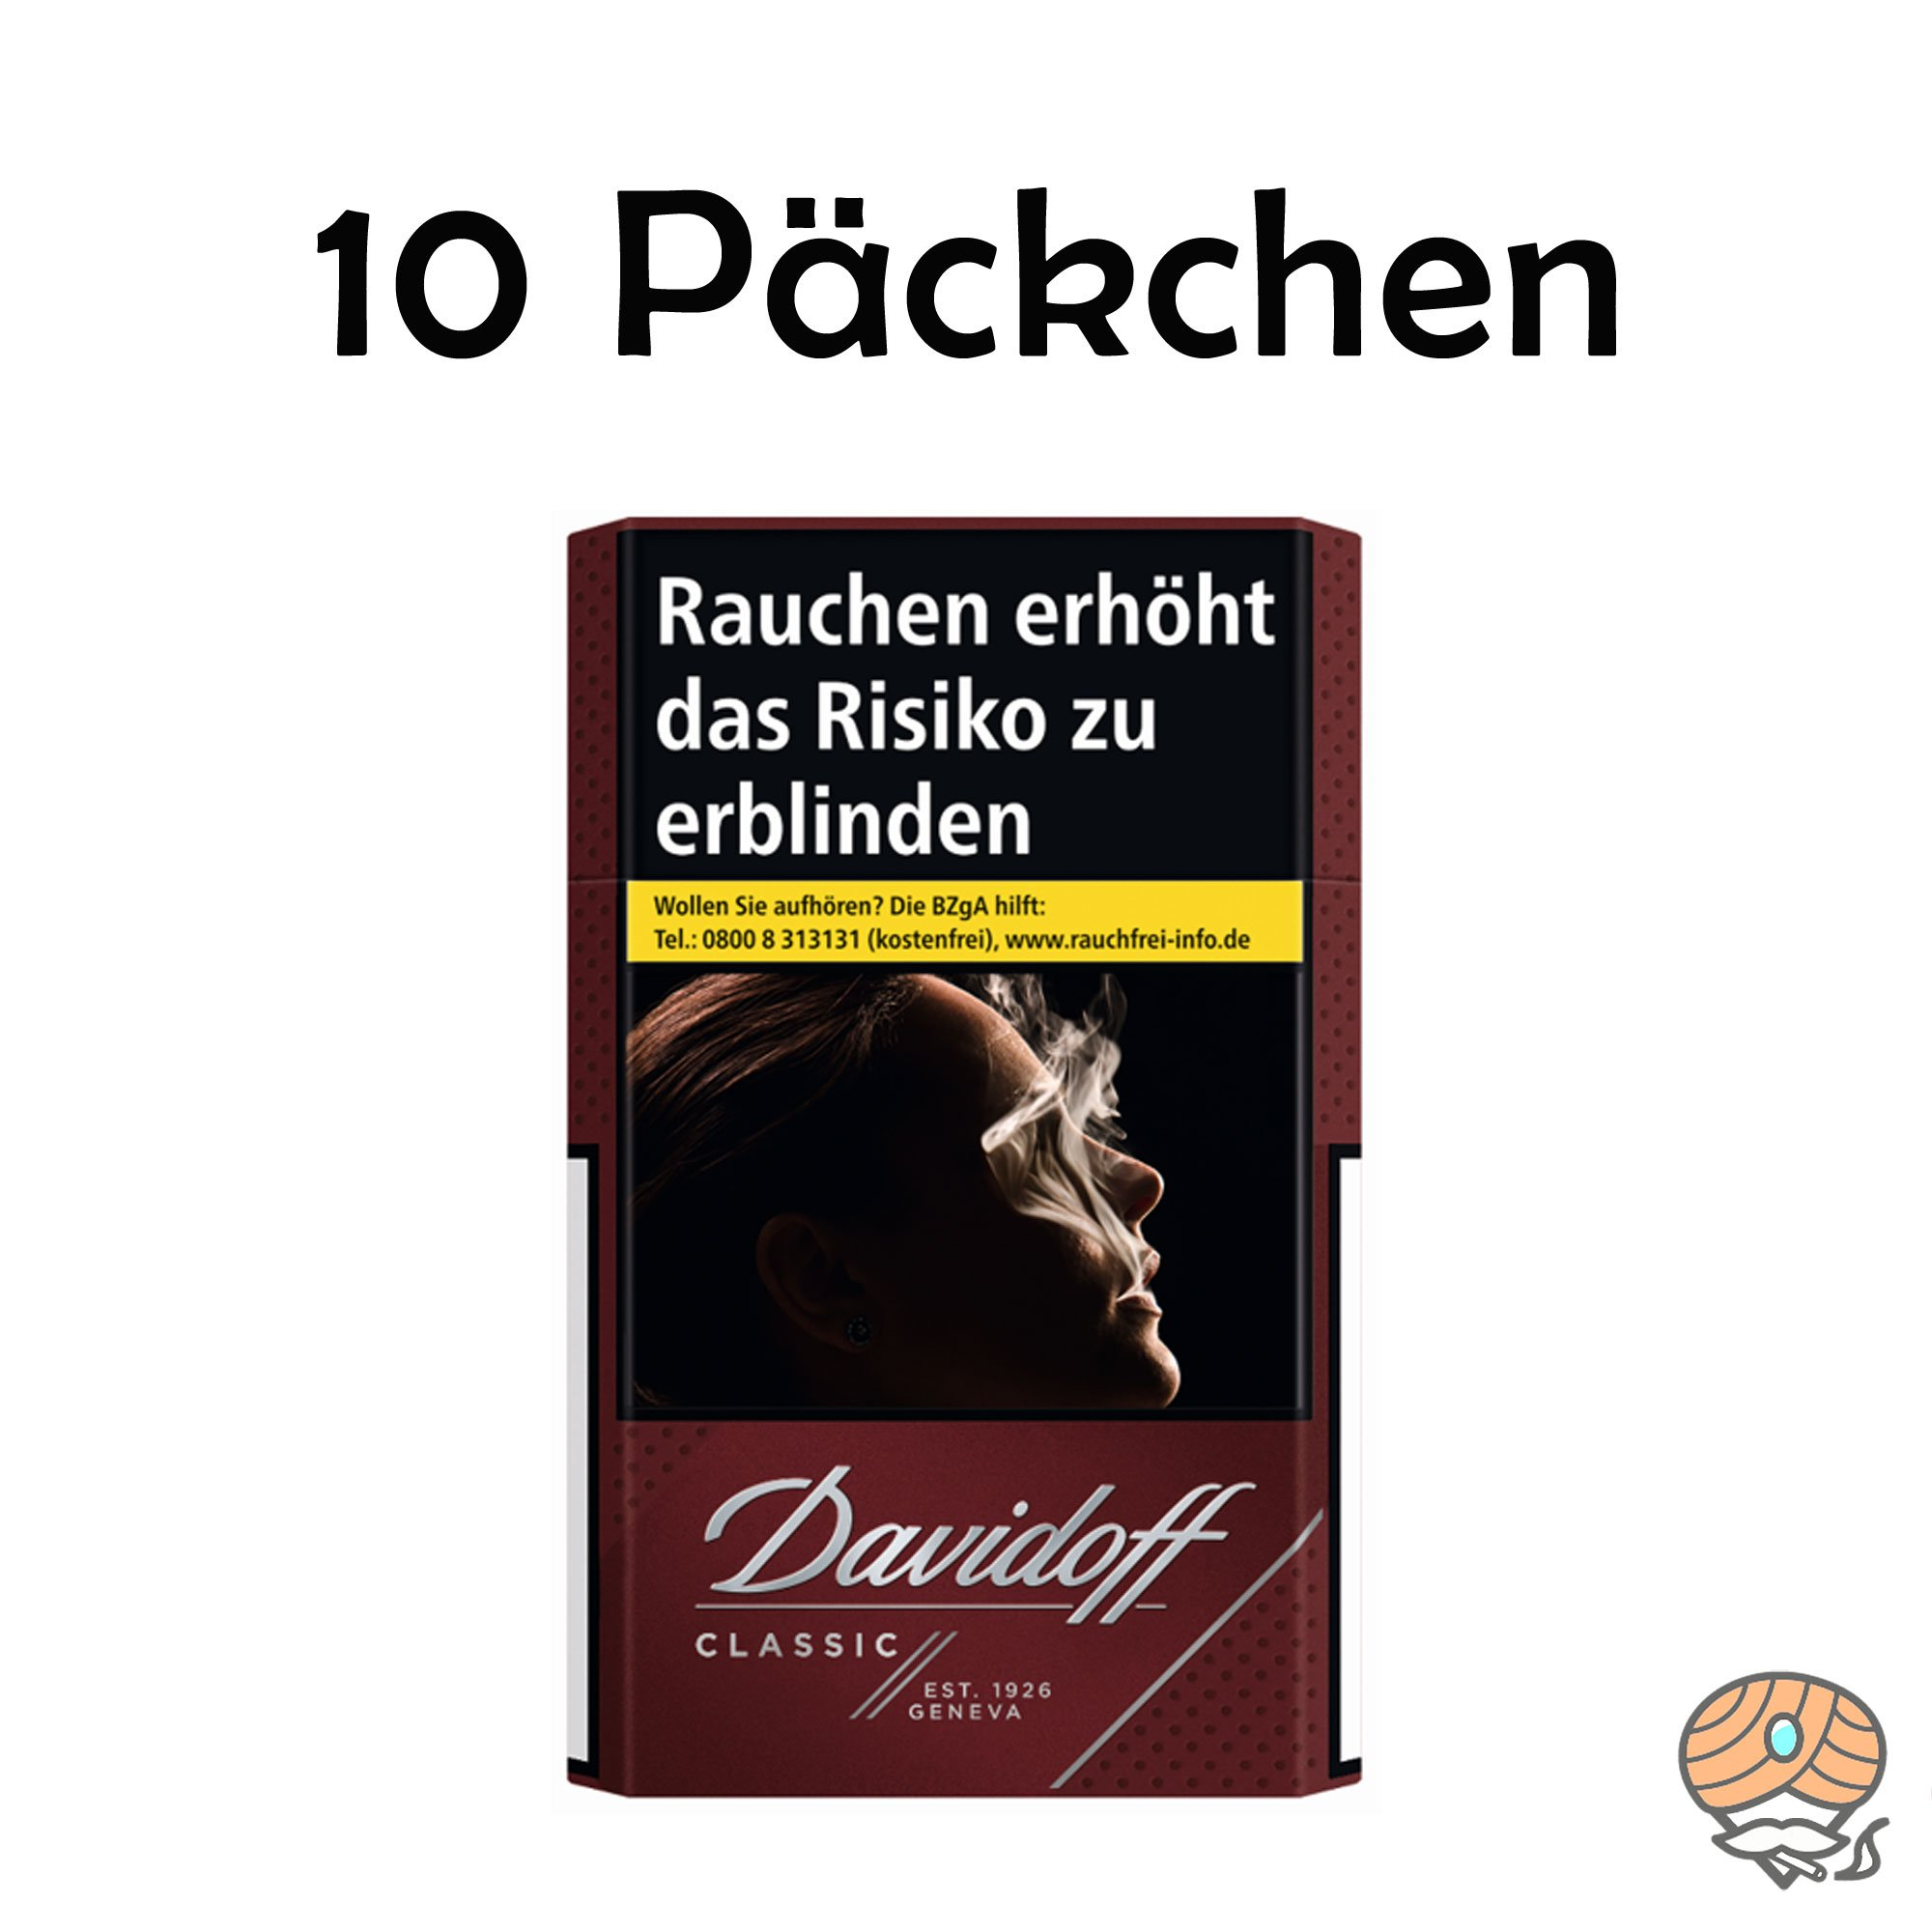 Davidoff Classic Zigaretten 10 x 20 Stück